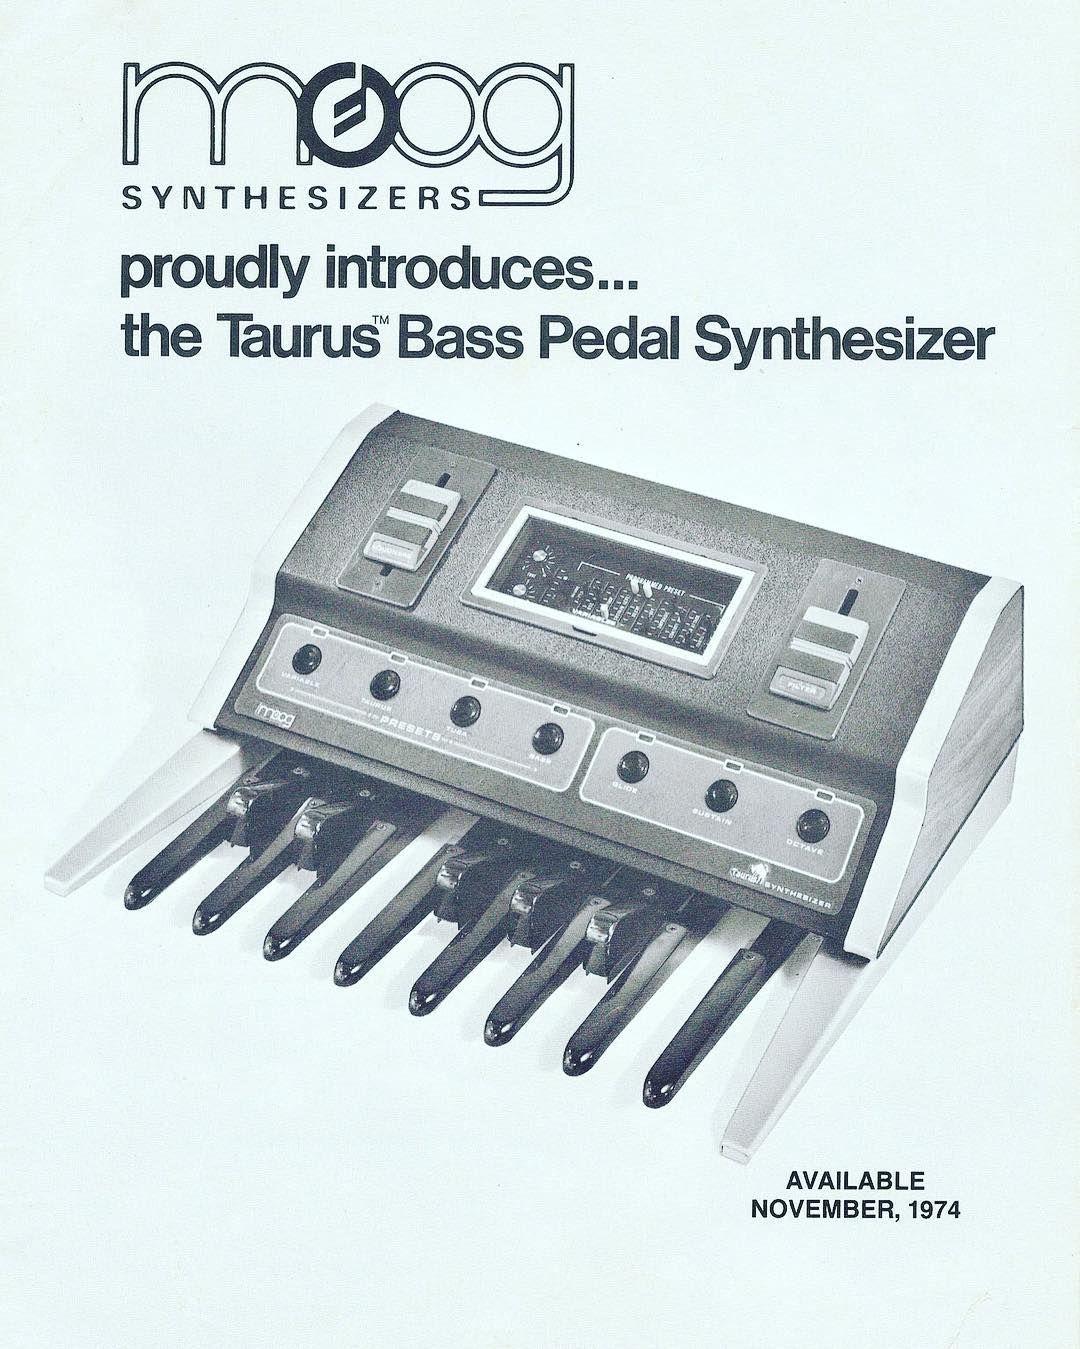 Moog Taurus #moog#taurus#moogtaurus#synth#synths#pedalbass#pedal#bass#music#gearporn#studioporn#analogue#analog#analogsynth#electronic#electronicmusic#roland#korg#oberheim#synthesizer#add#brochure by illusio_music